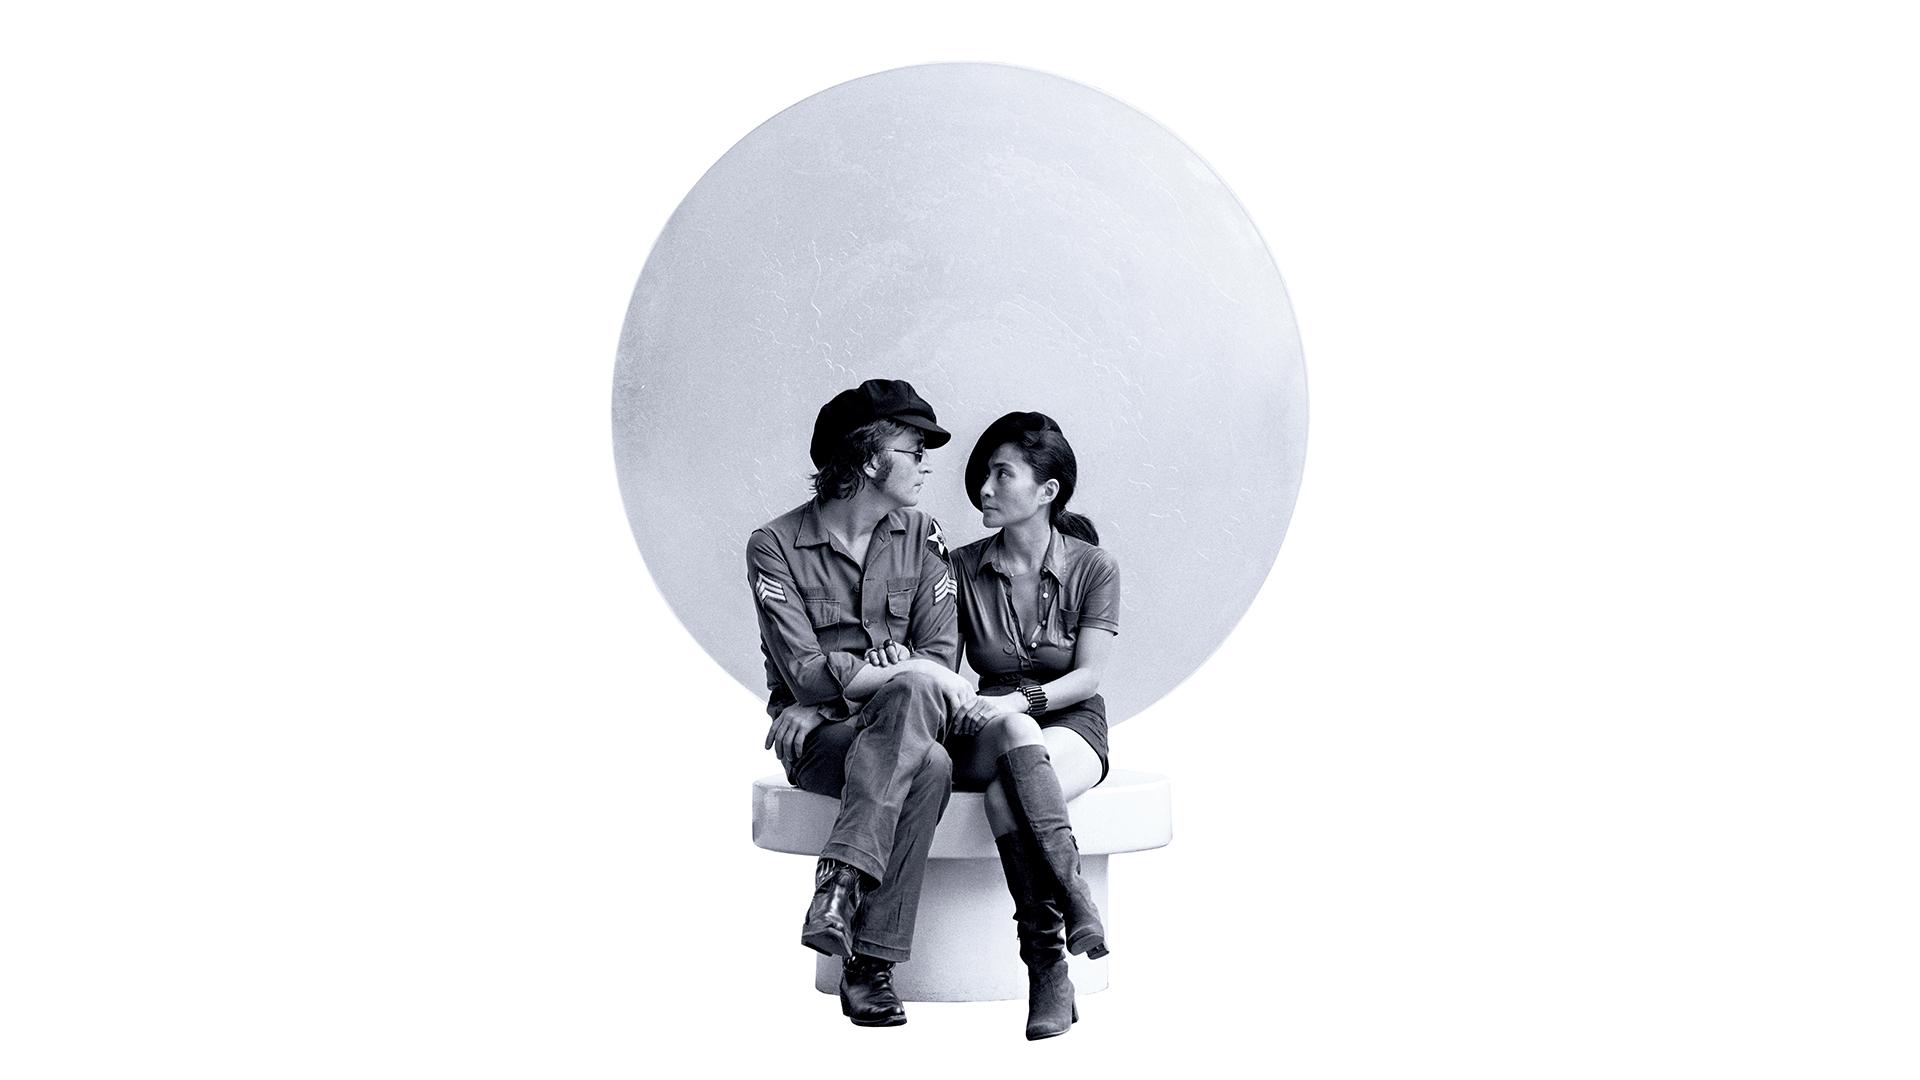 Imagine - John Lennon & Jono Yoko